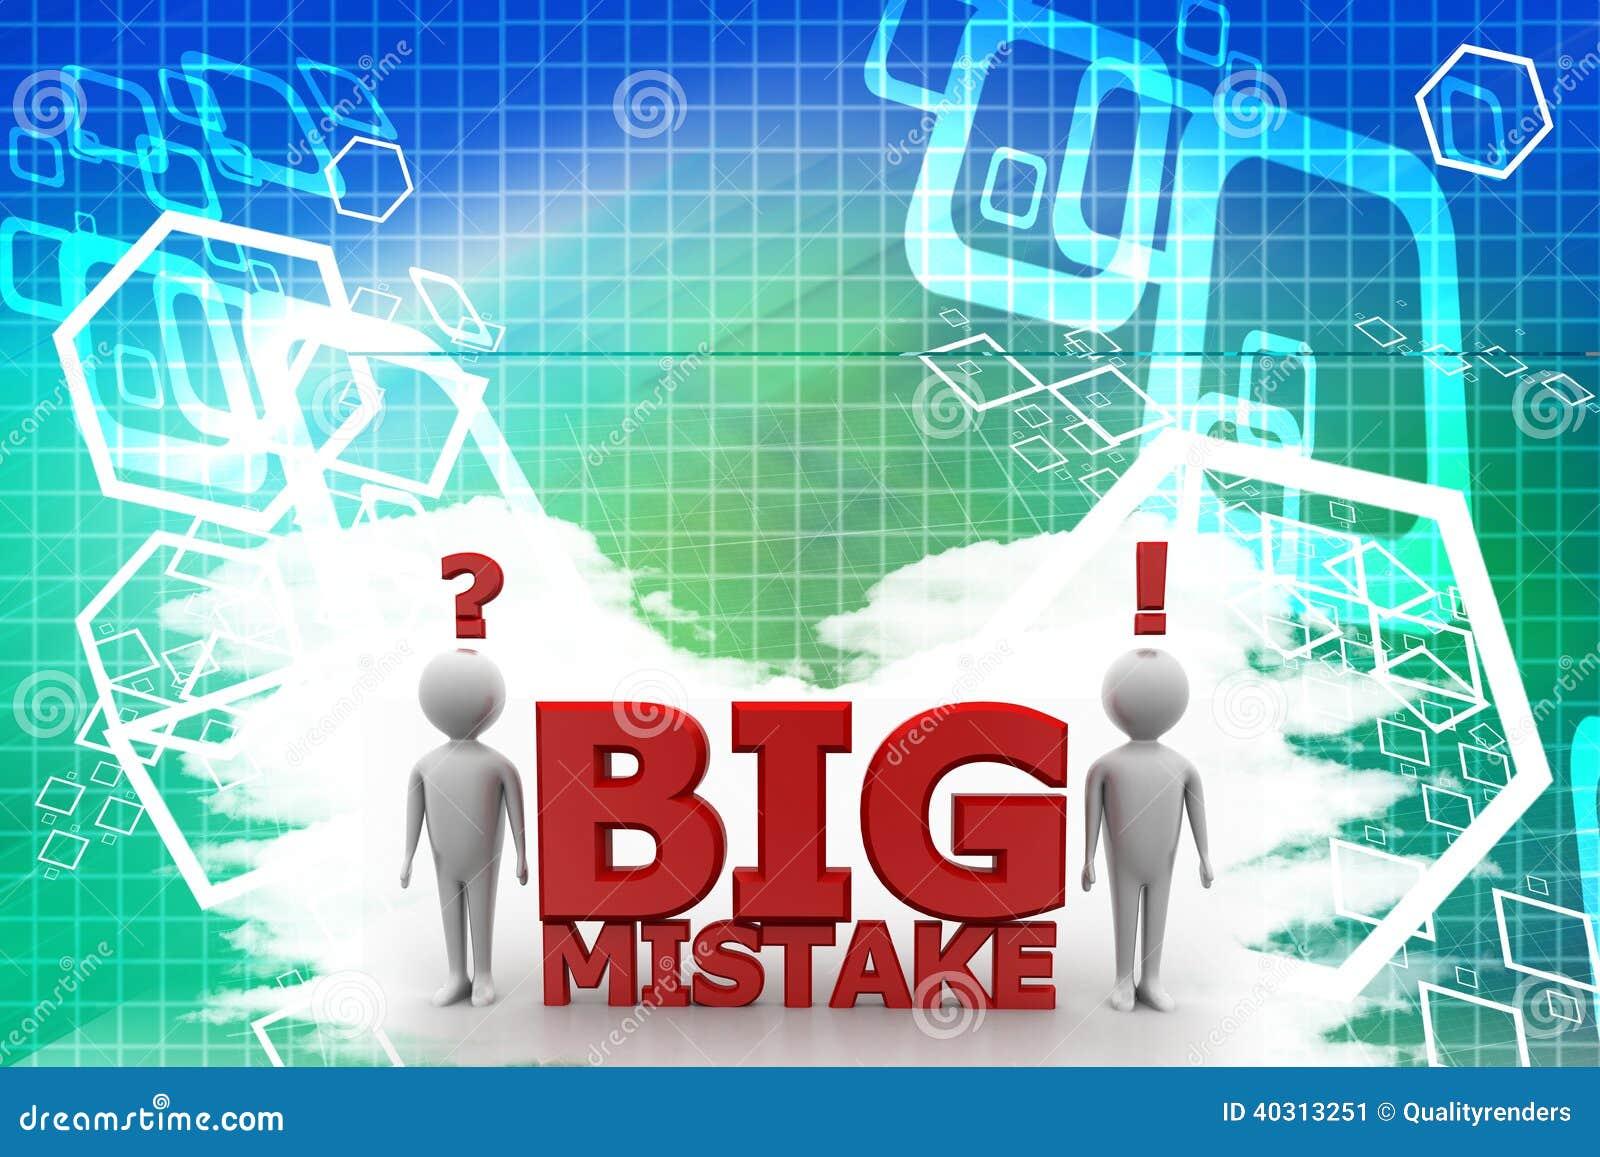 Big Mistake Illustration With Human Illustration Stock